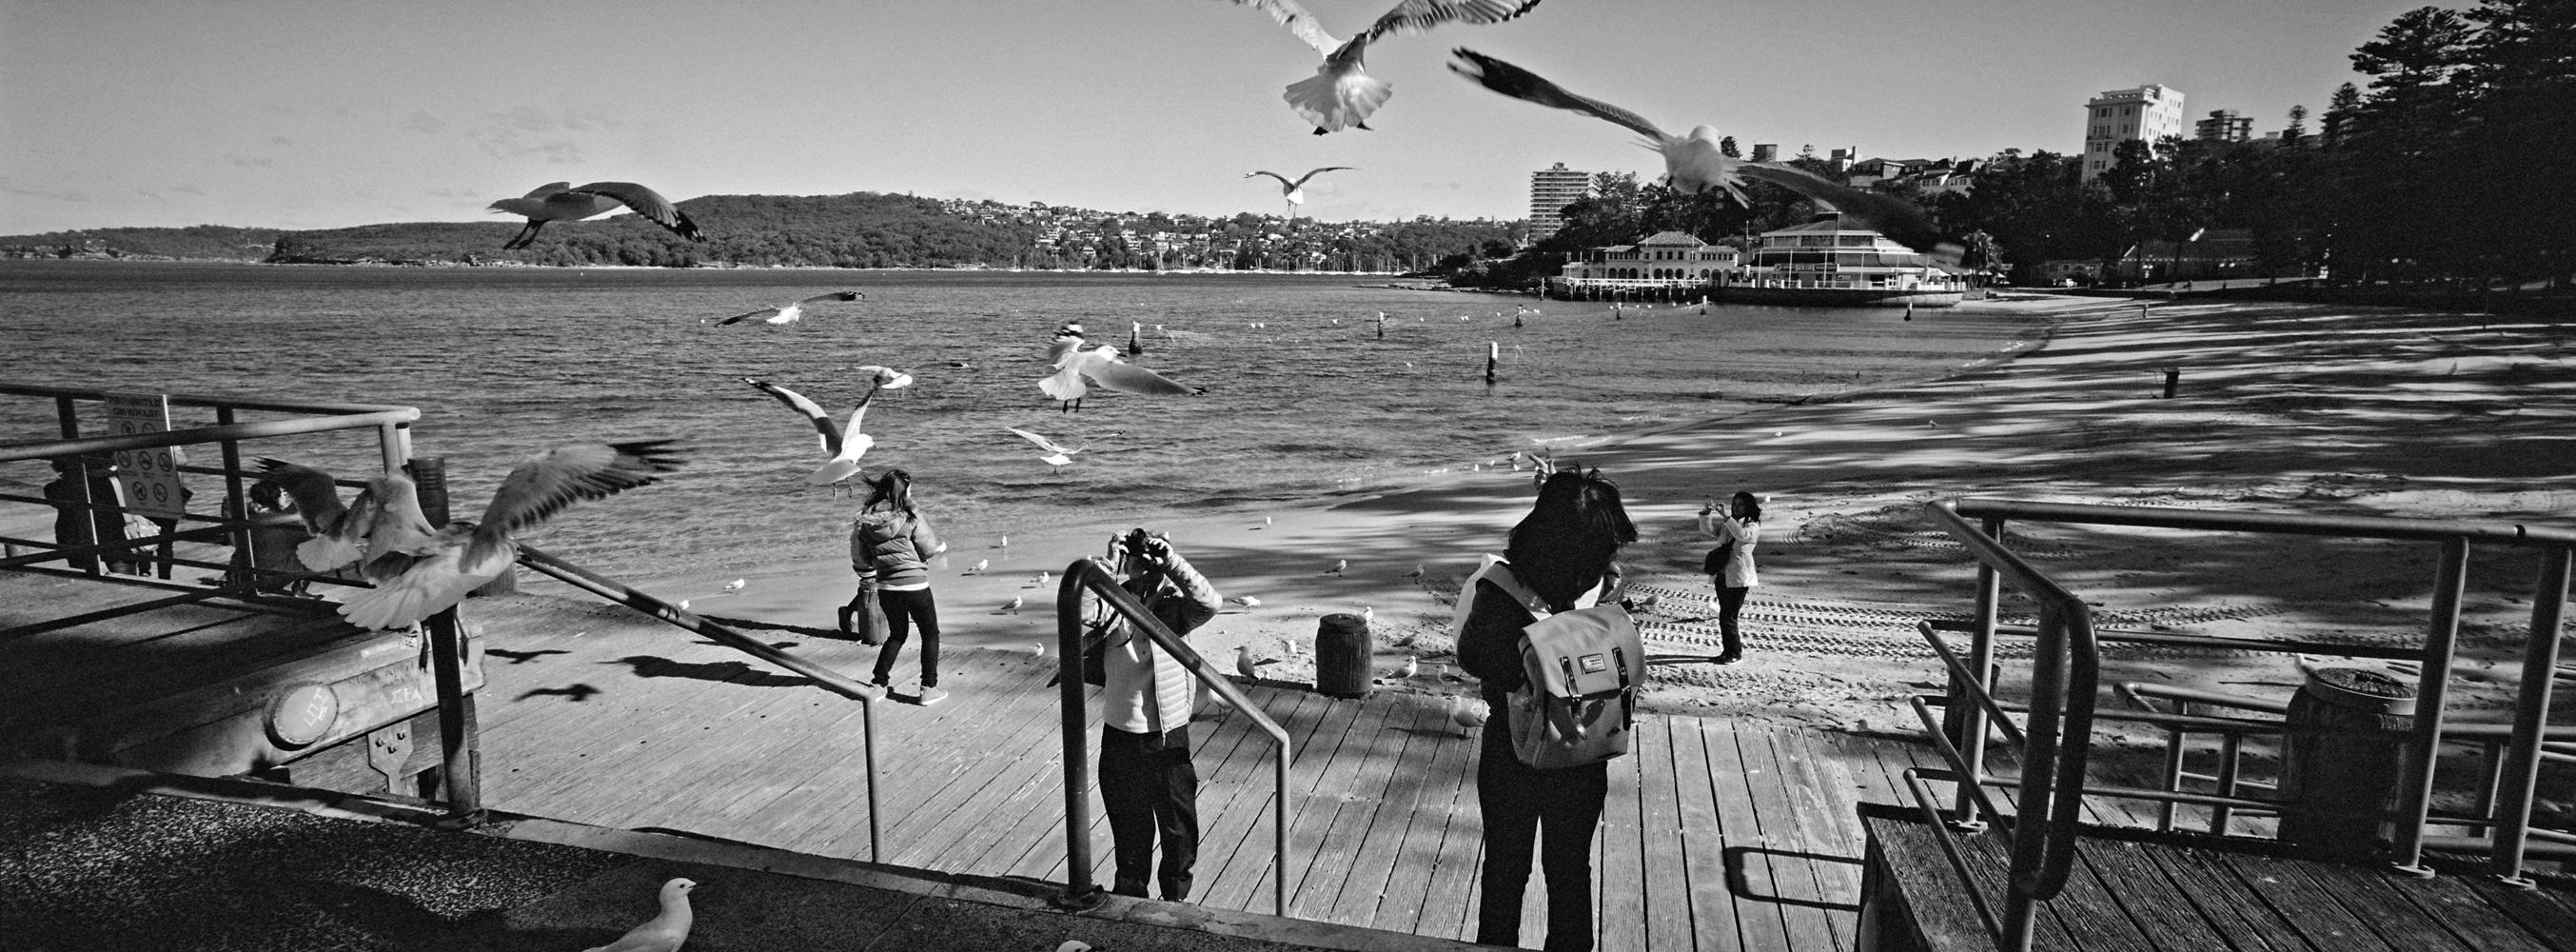 Seagulls Attack!